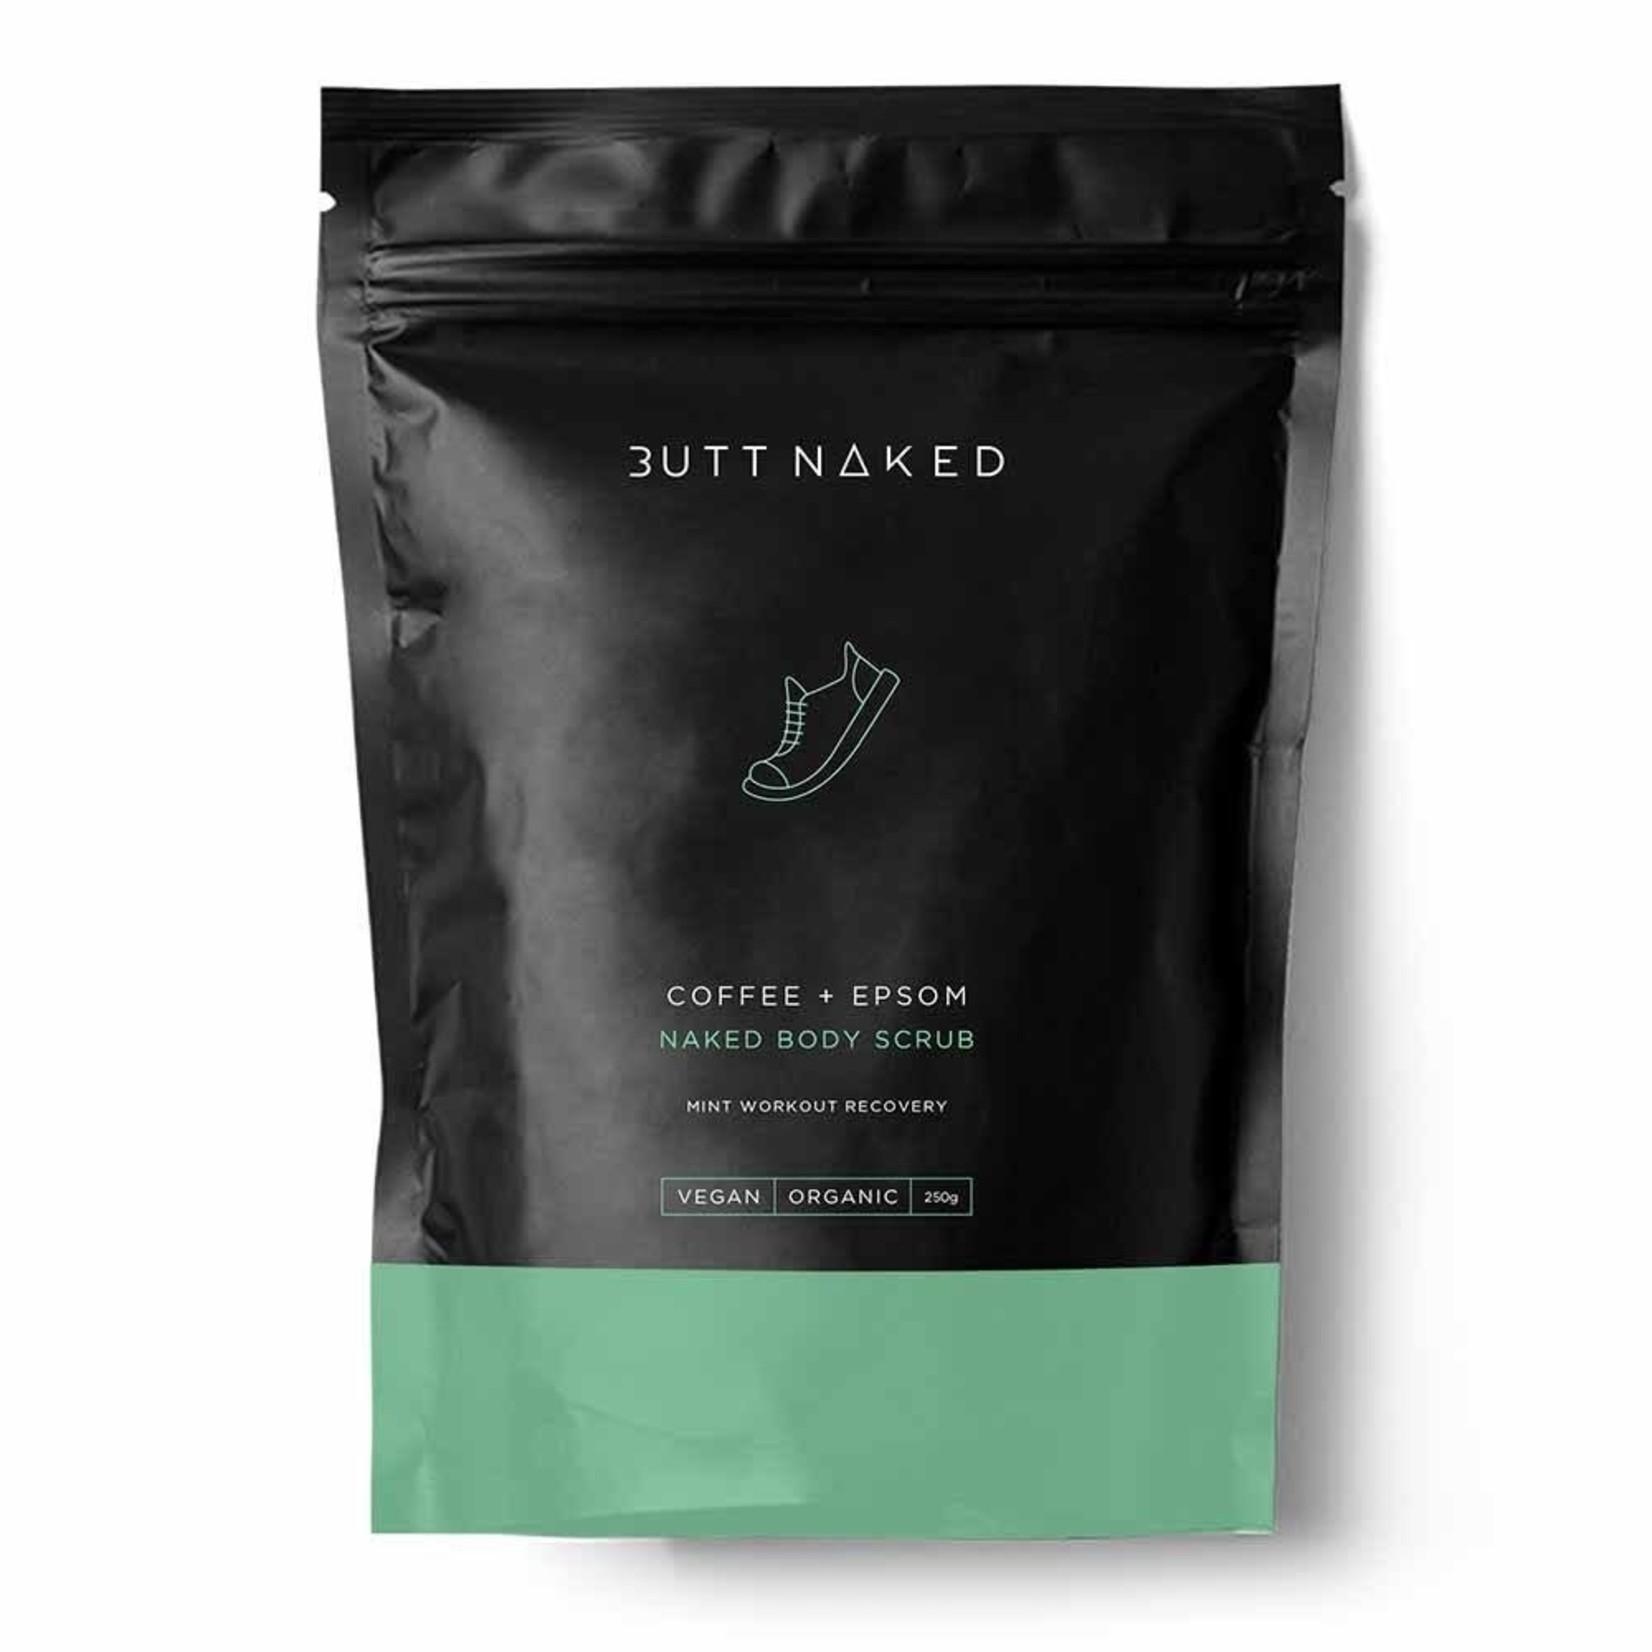 Butt Naked Butt Naked Natural Body Scrub Coffe & Epson